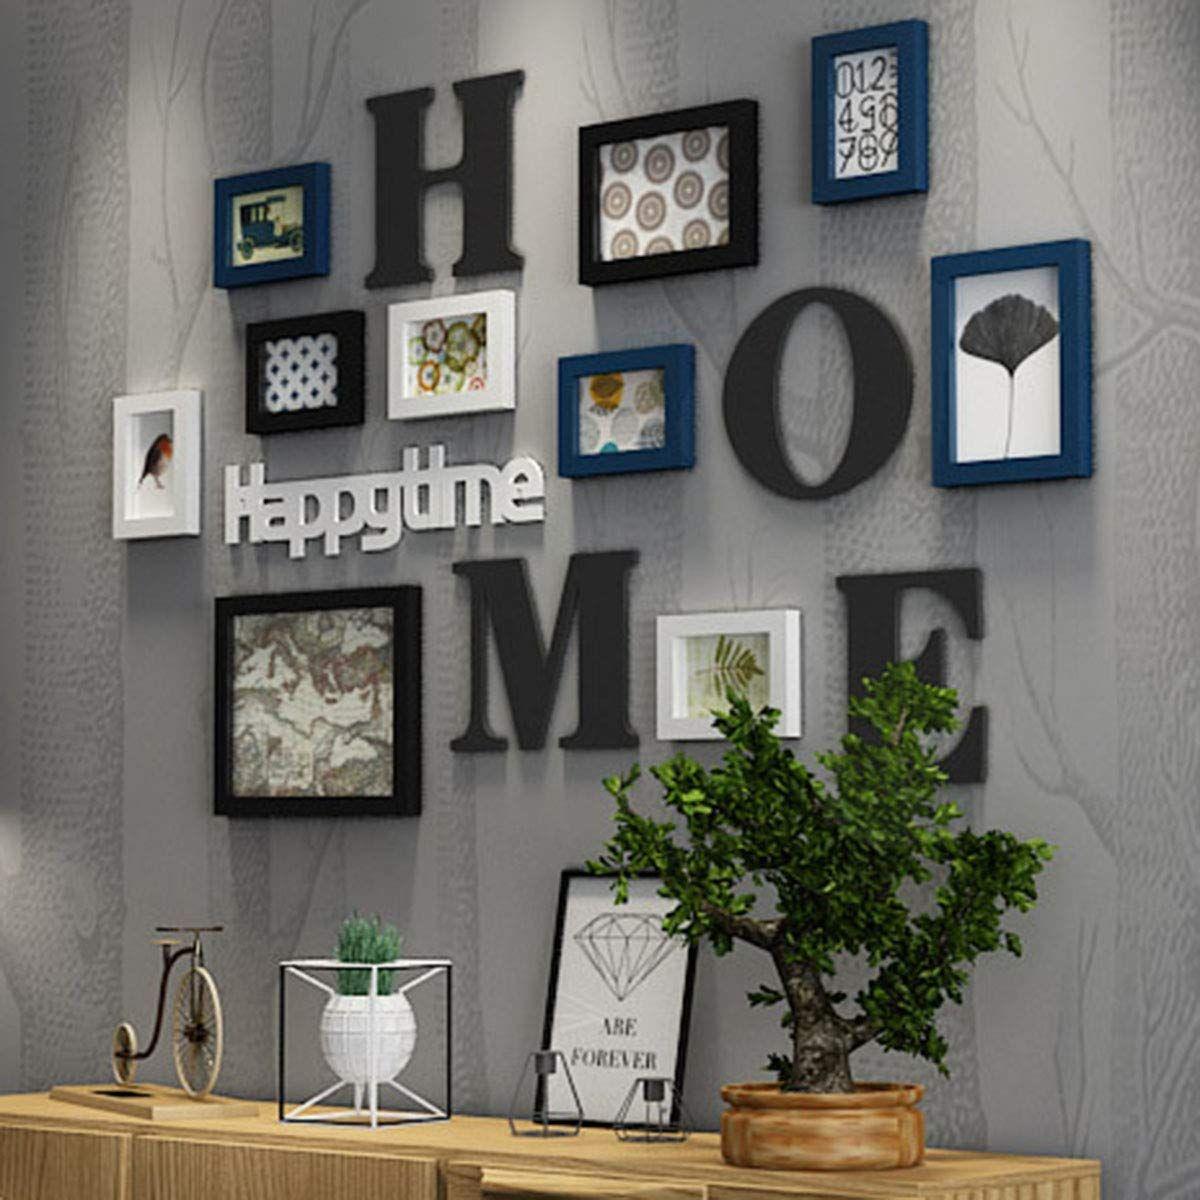 Cadre photo deco cadre photo photos Multi Cadre Cadre Modern collage galerie